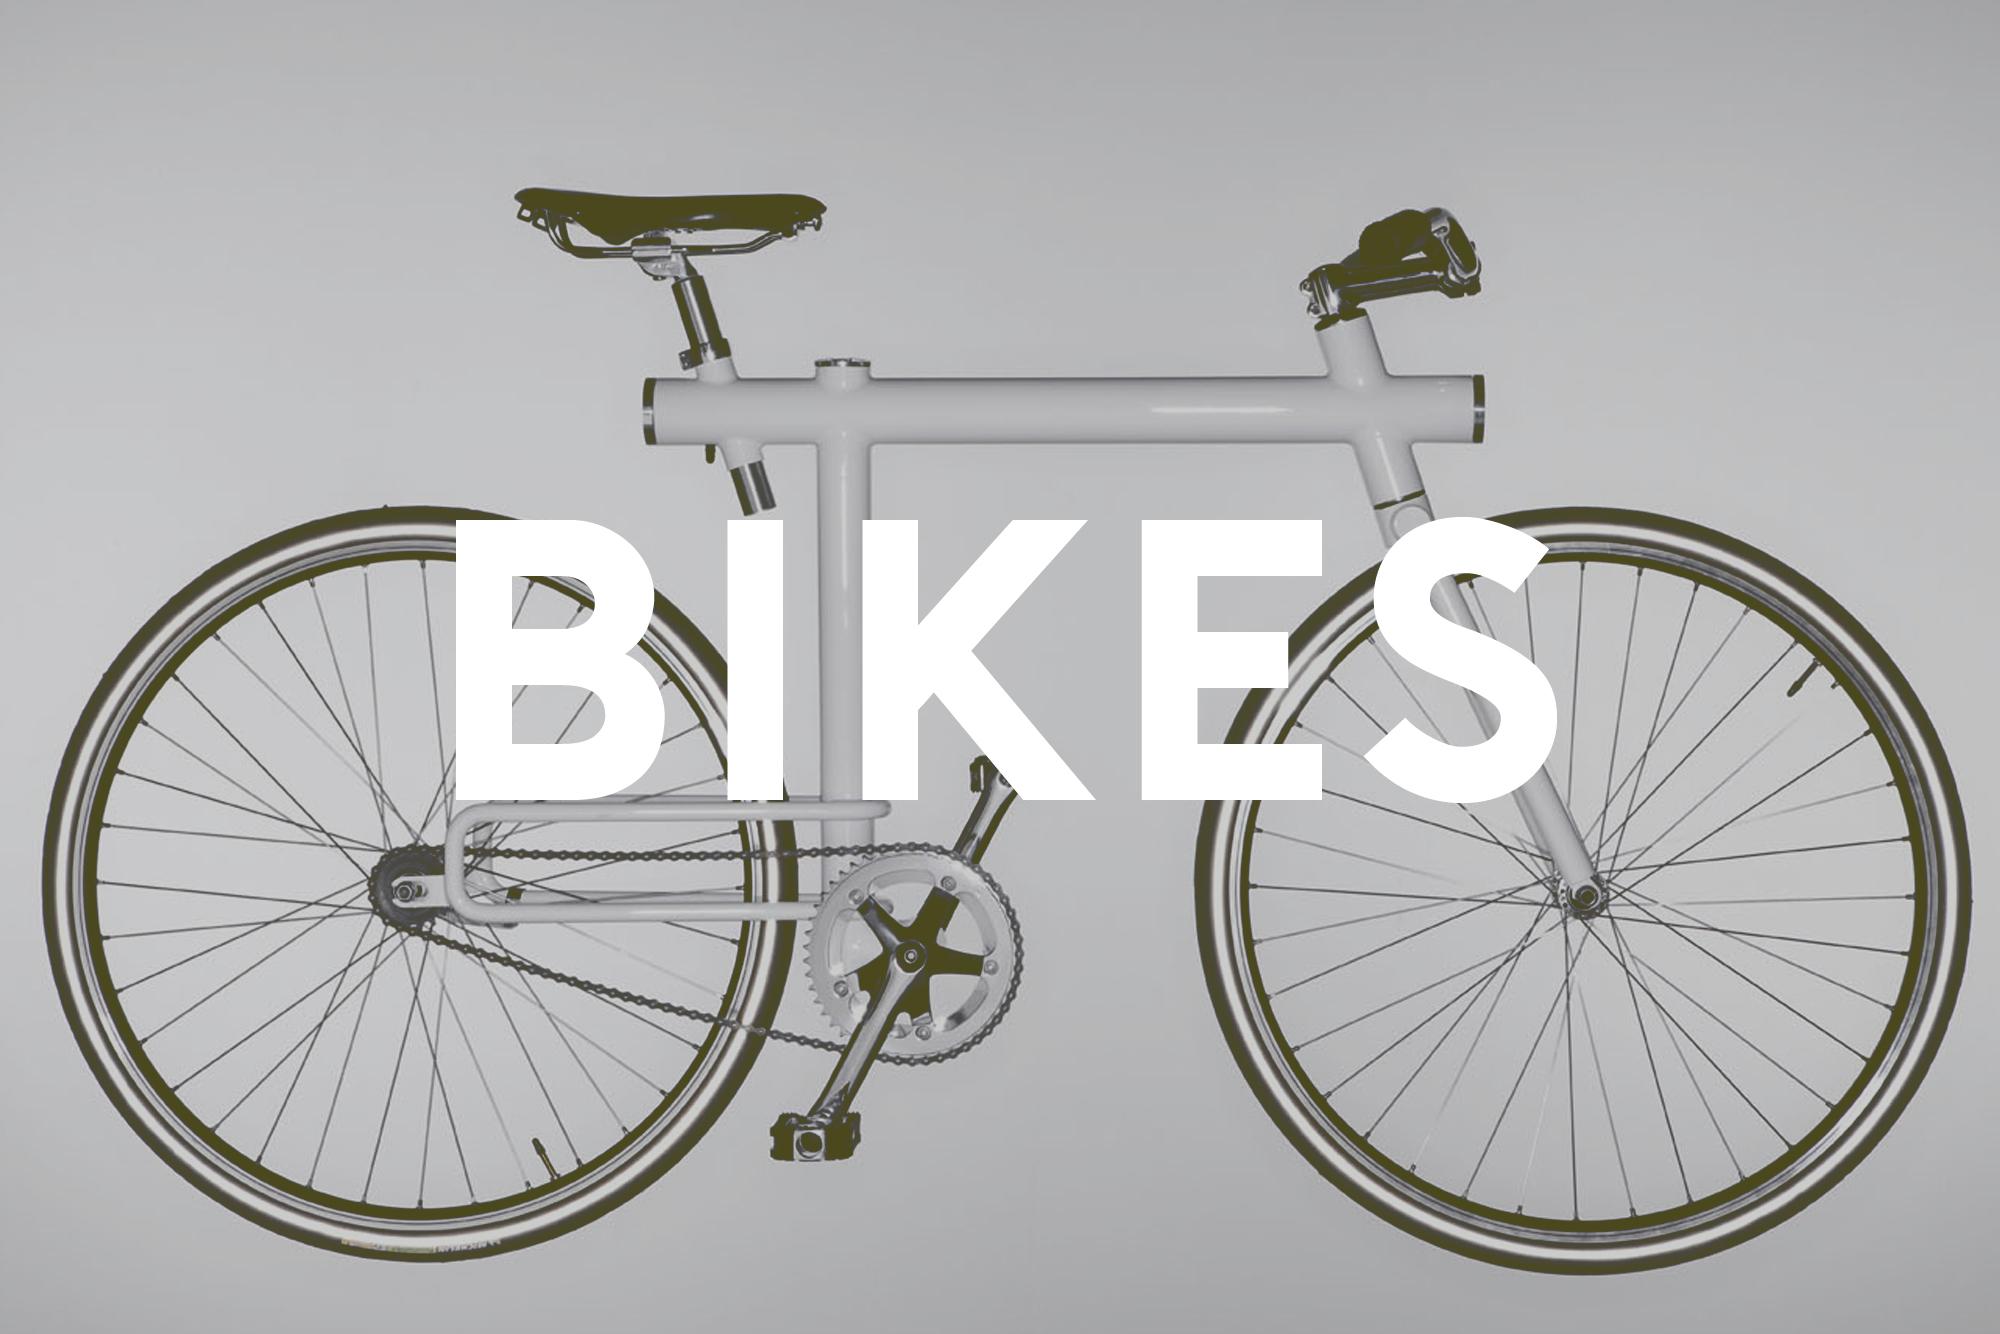 erman_bike_bikes